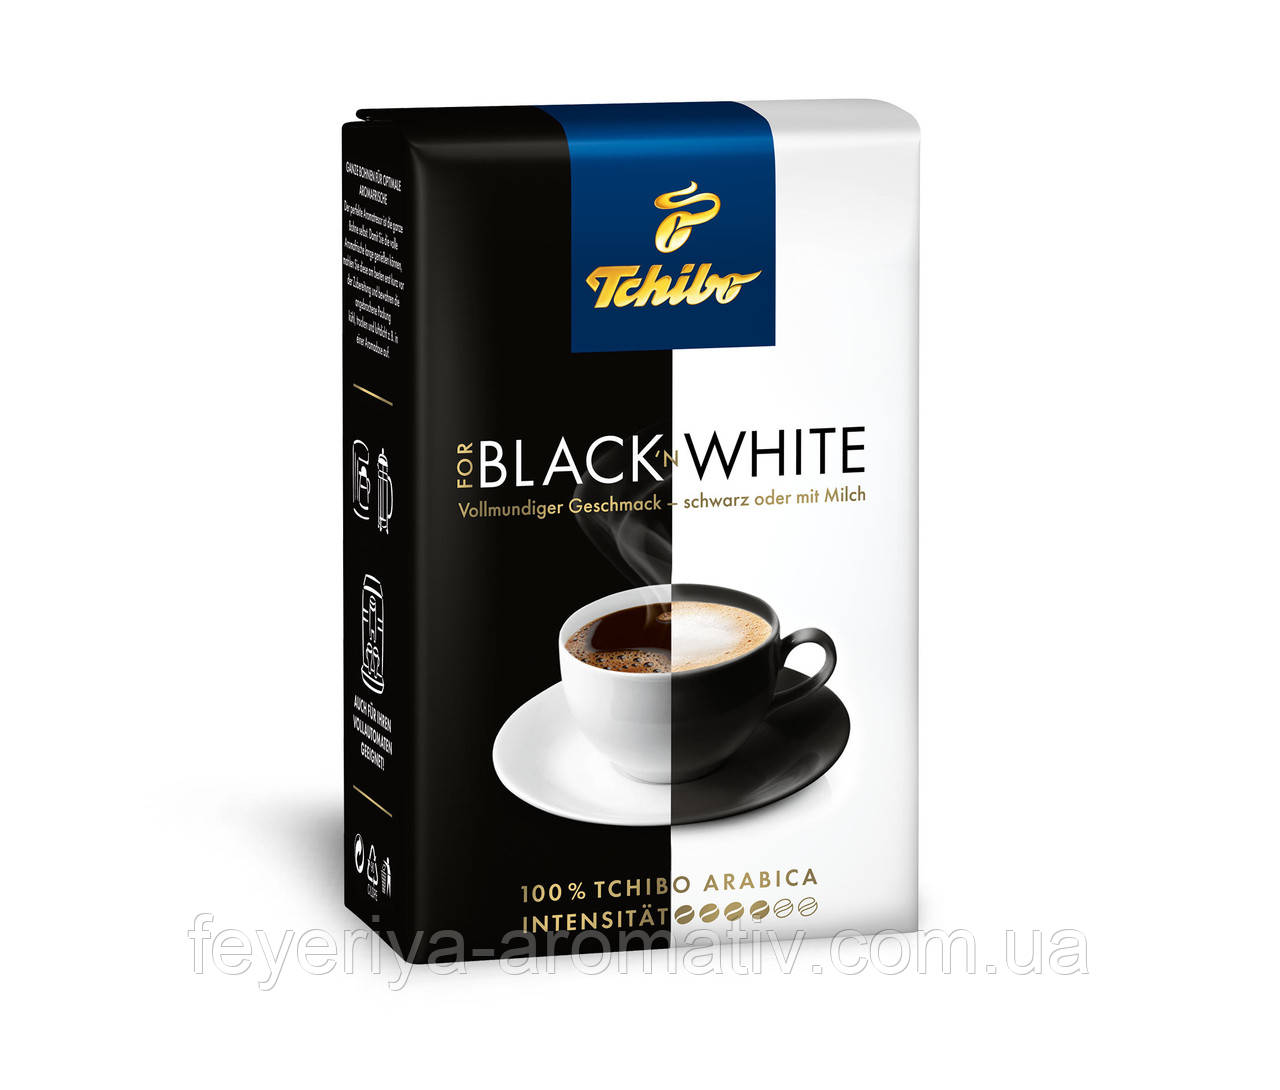 Кофе молотый Tchibo Black & White 250гр. (Германия)